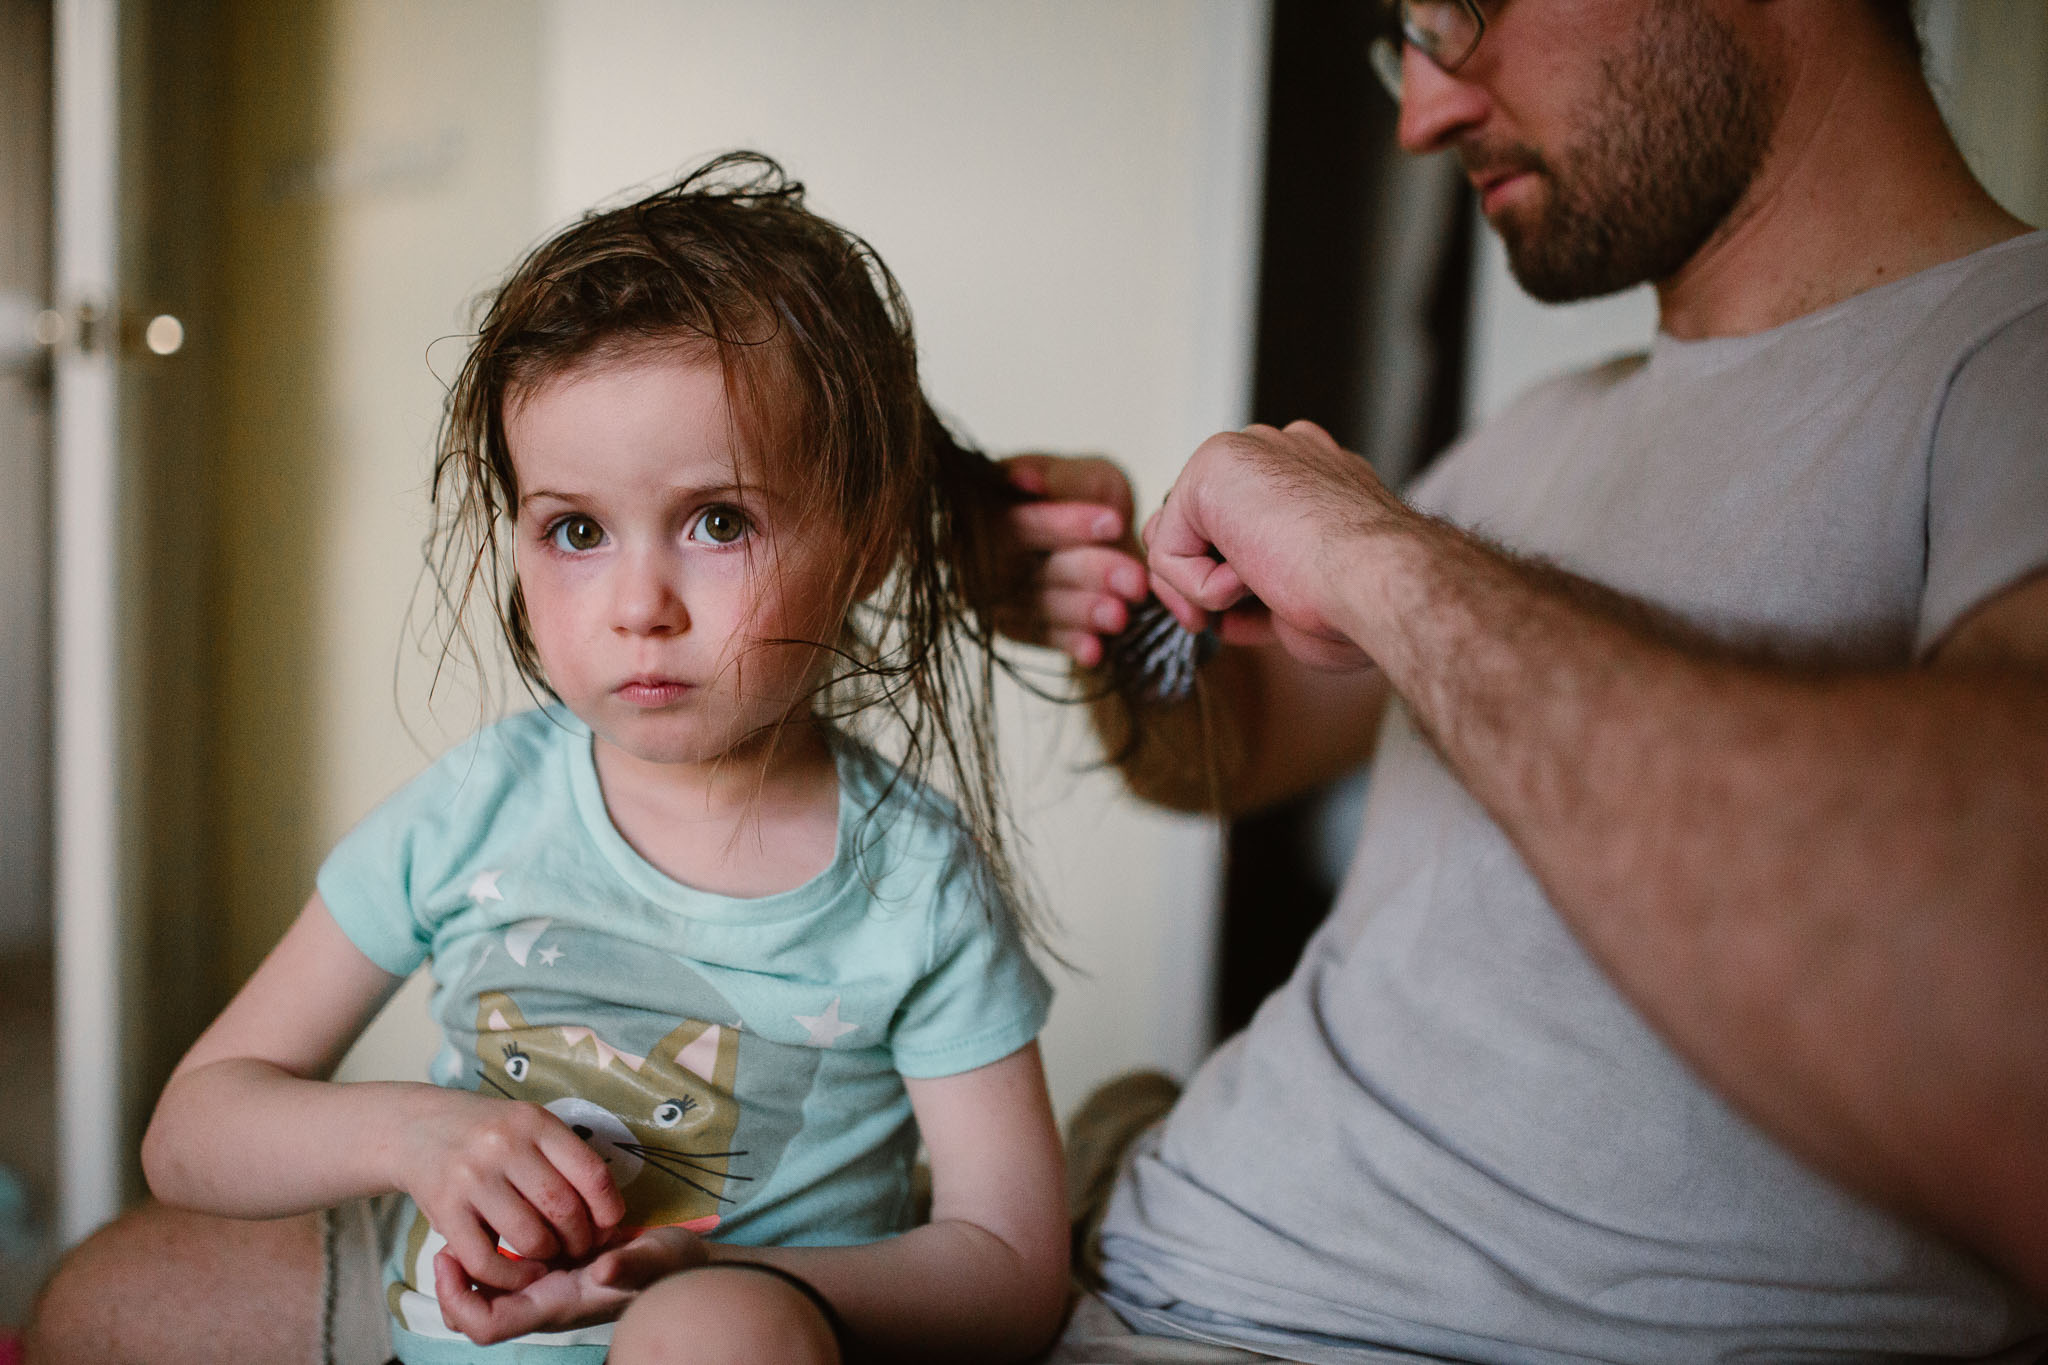 dad brushing toddler's hair lifestyle childhood family photography ashburn, virginia